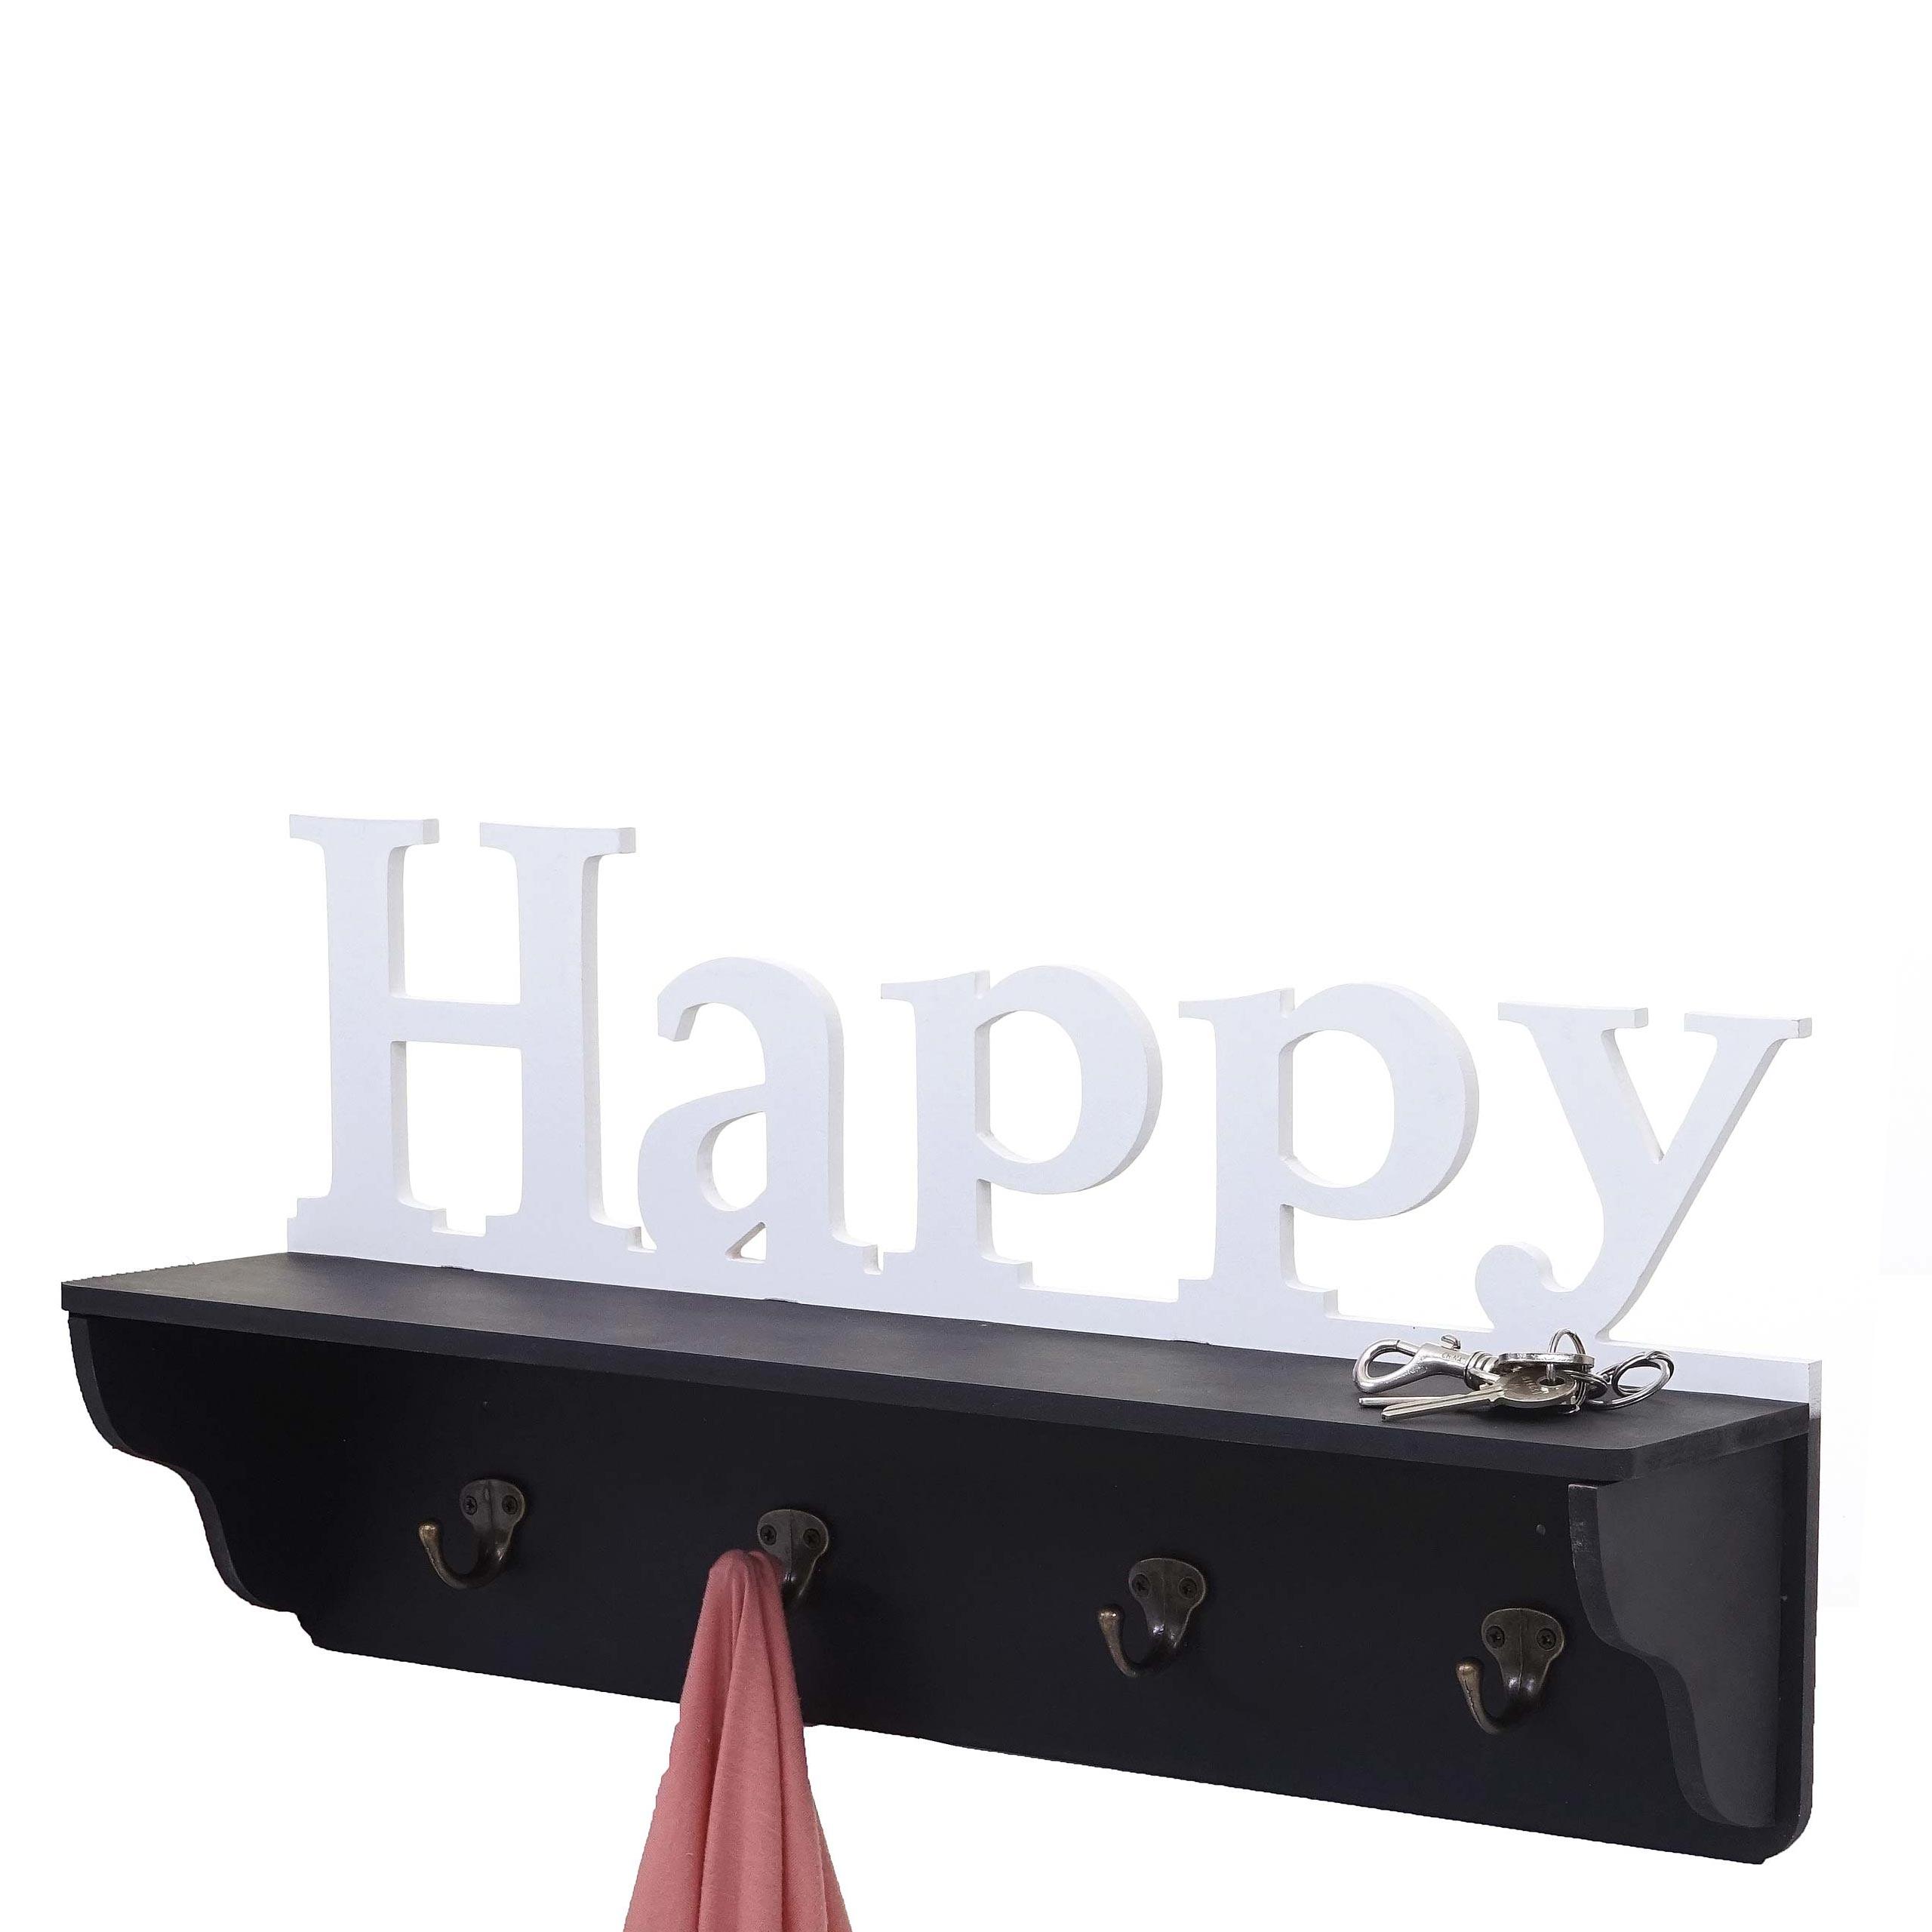 wandgarderobe hwc d41 happy garderobe regal 4 haken. Black Bedroom Furniture Sets. Home Design Ideas